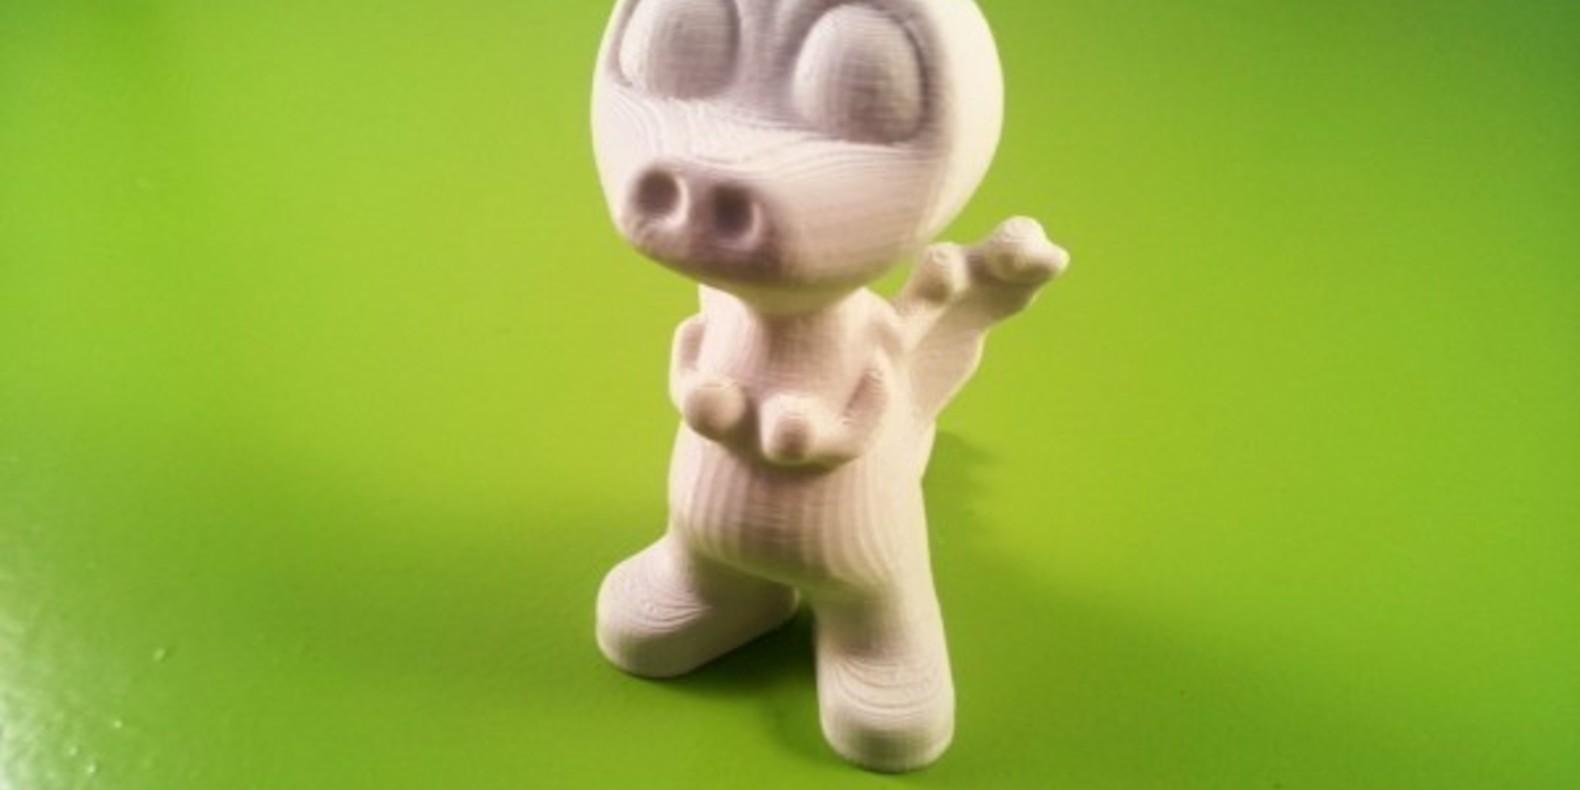 dolf veenvliet macouno cults3D cults designer artist 3D printing monkey skull dragon minotaur dorus manus 22